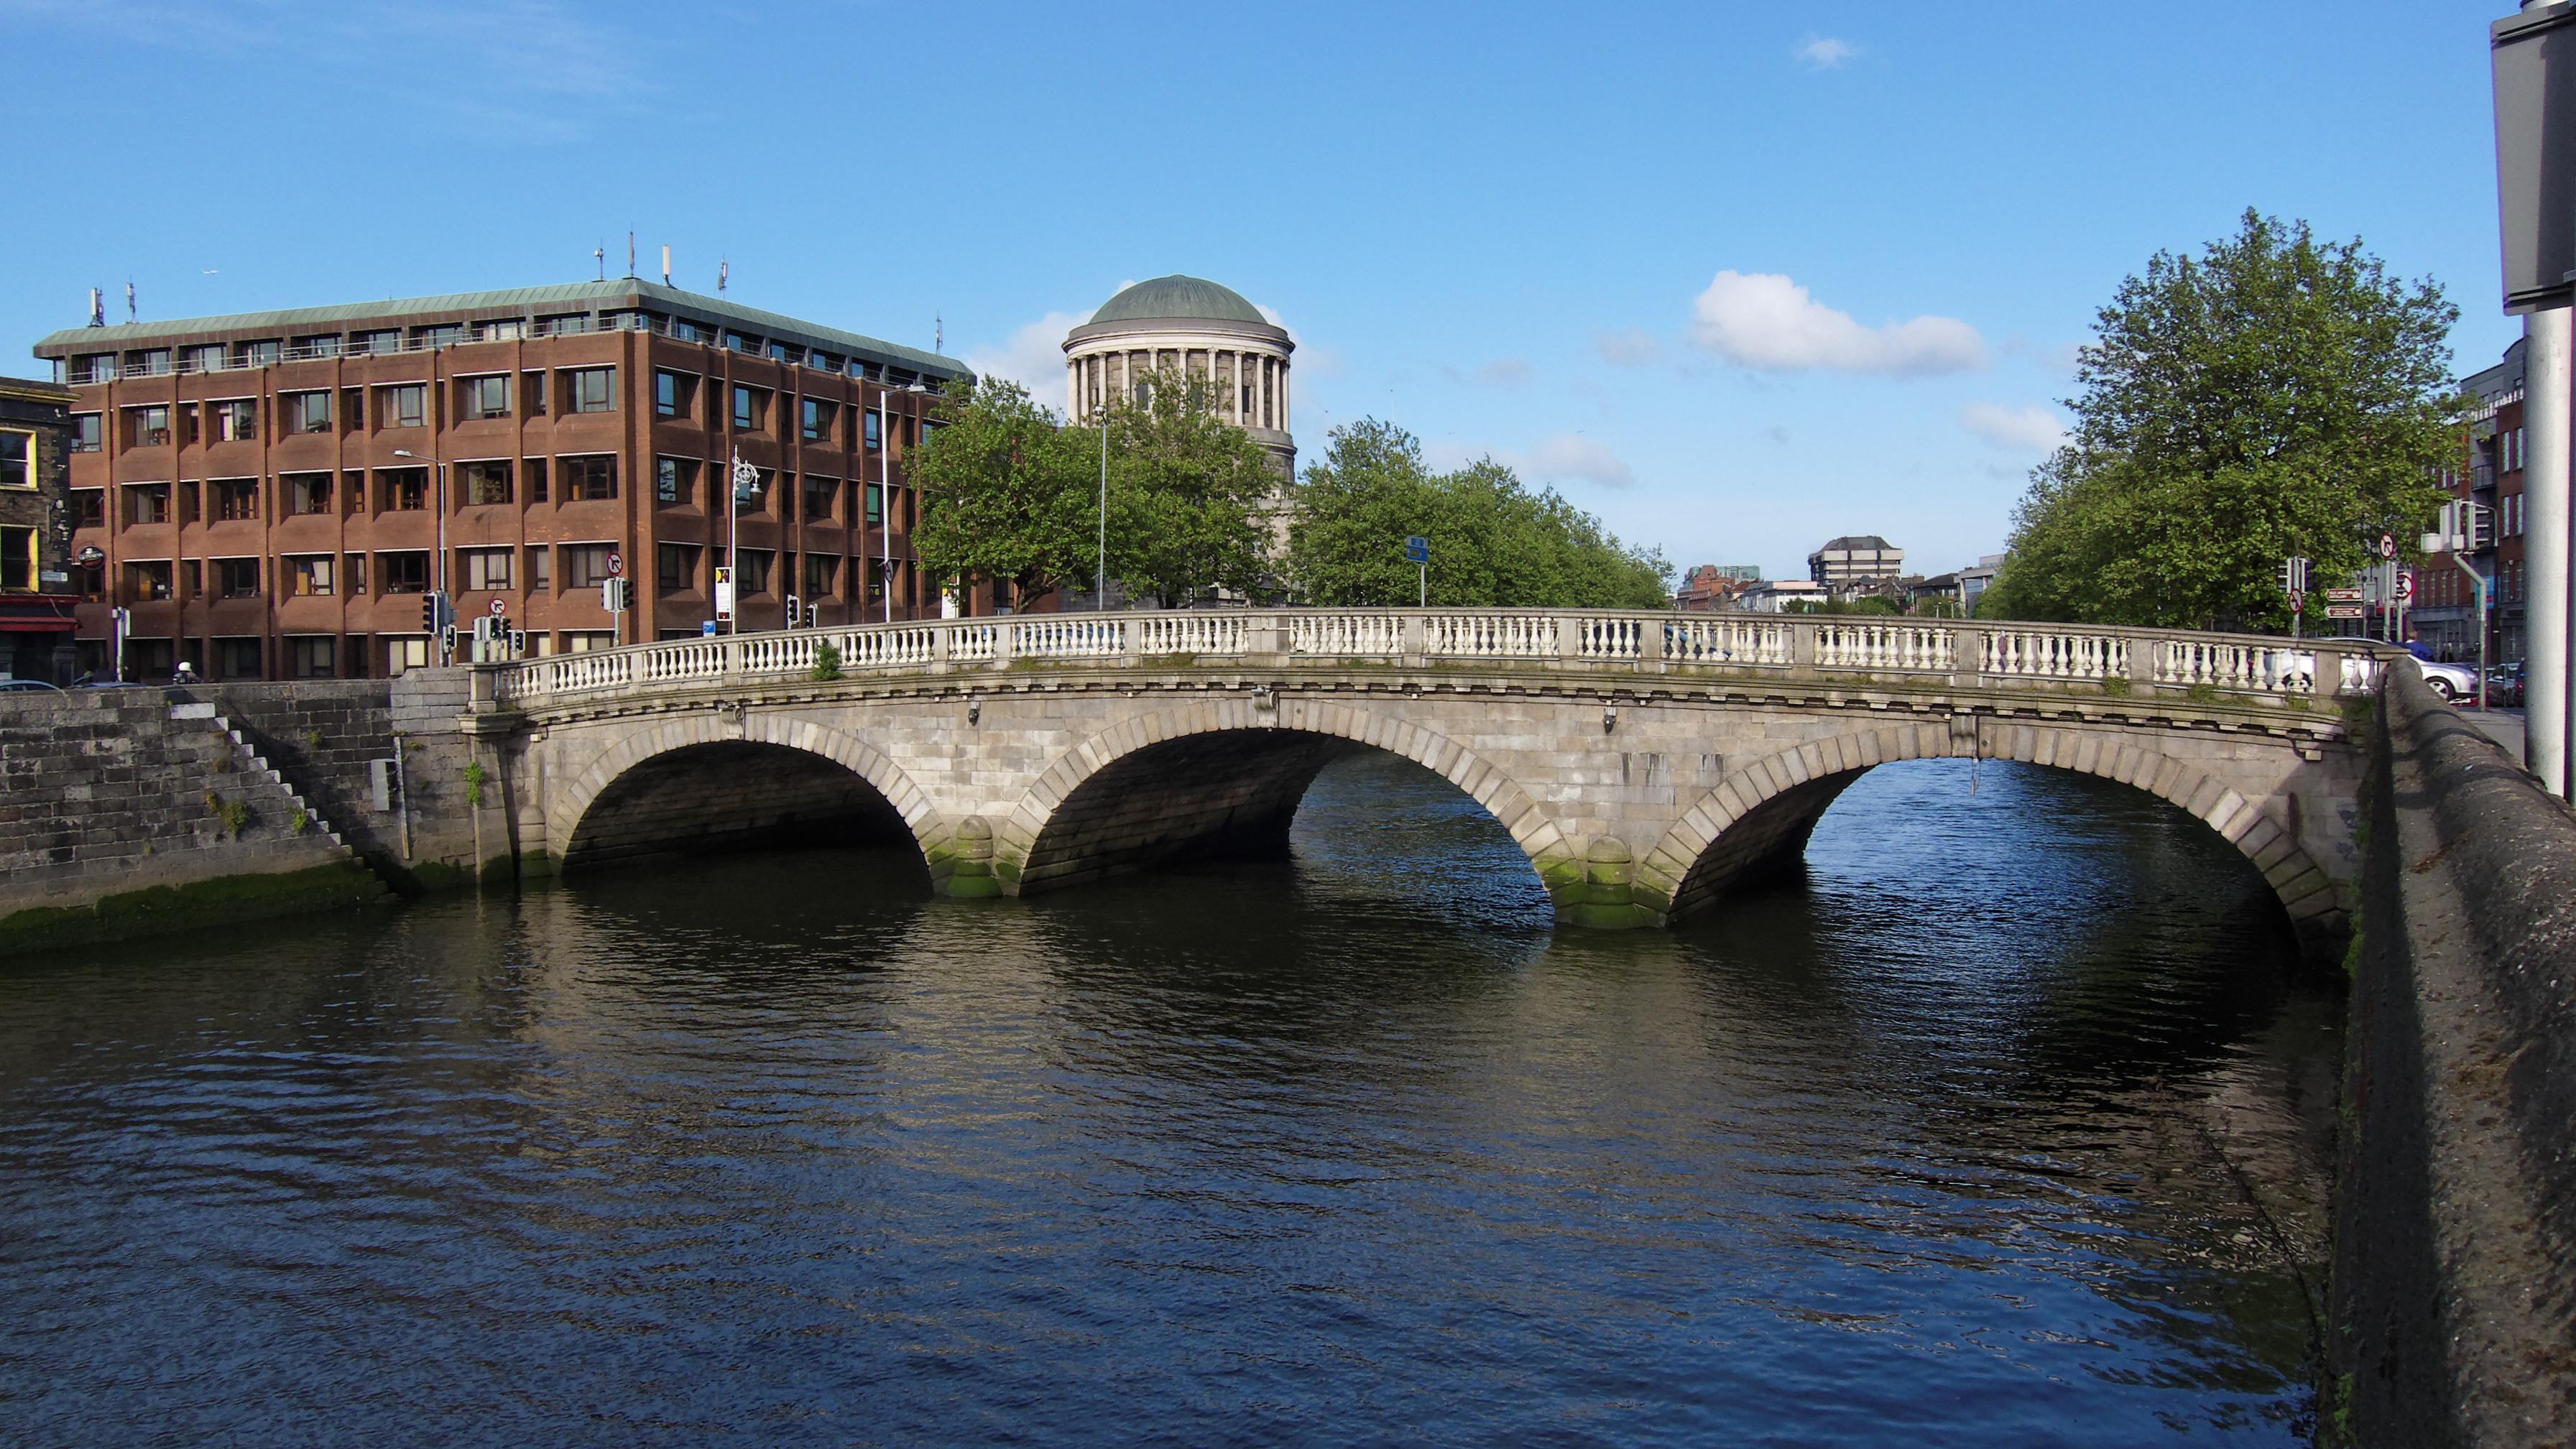 Dublin_-_Father_Mathew_Bridge_-_110508_182542.jpg